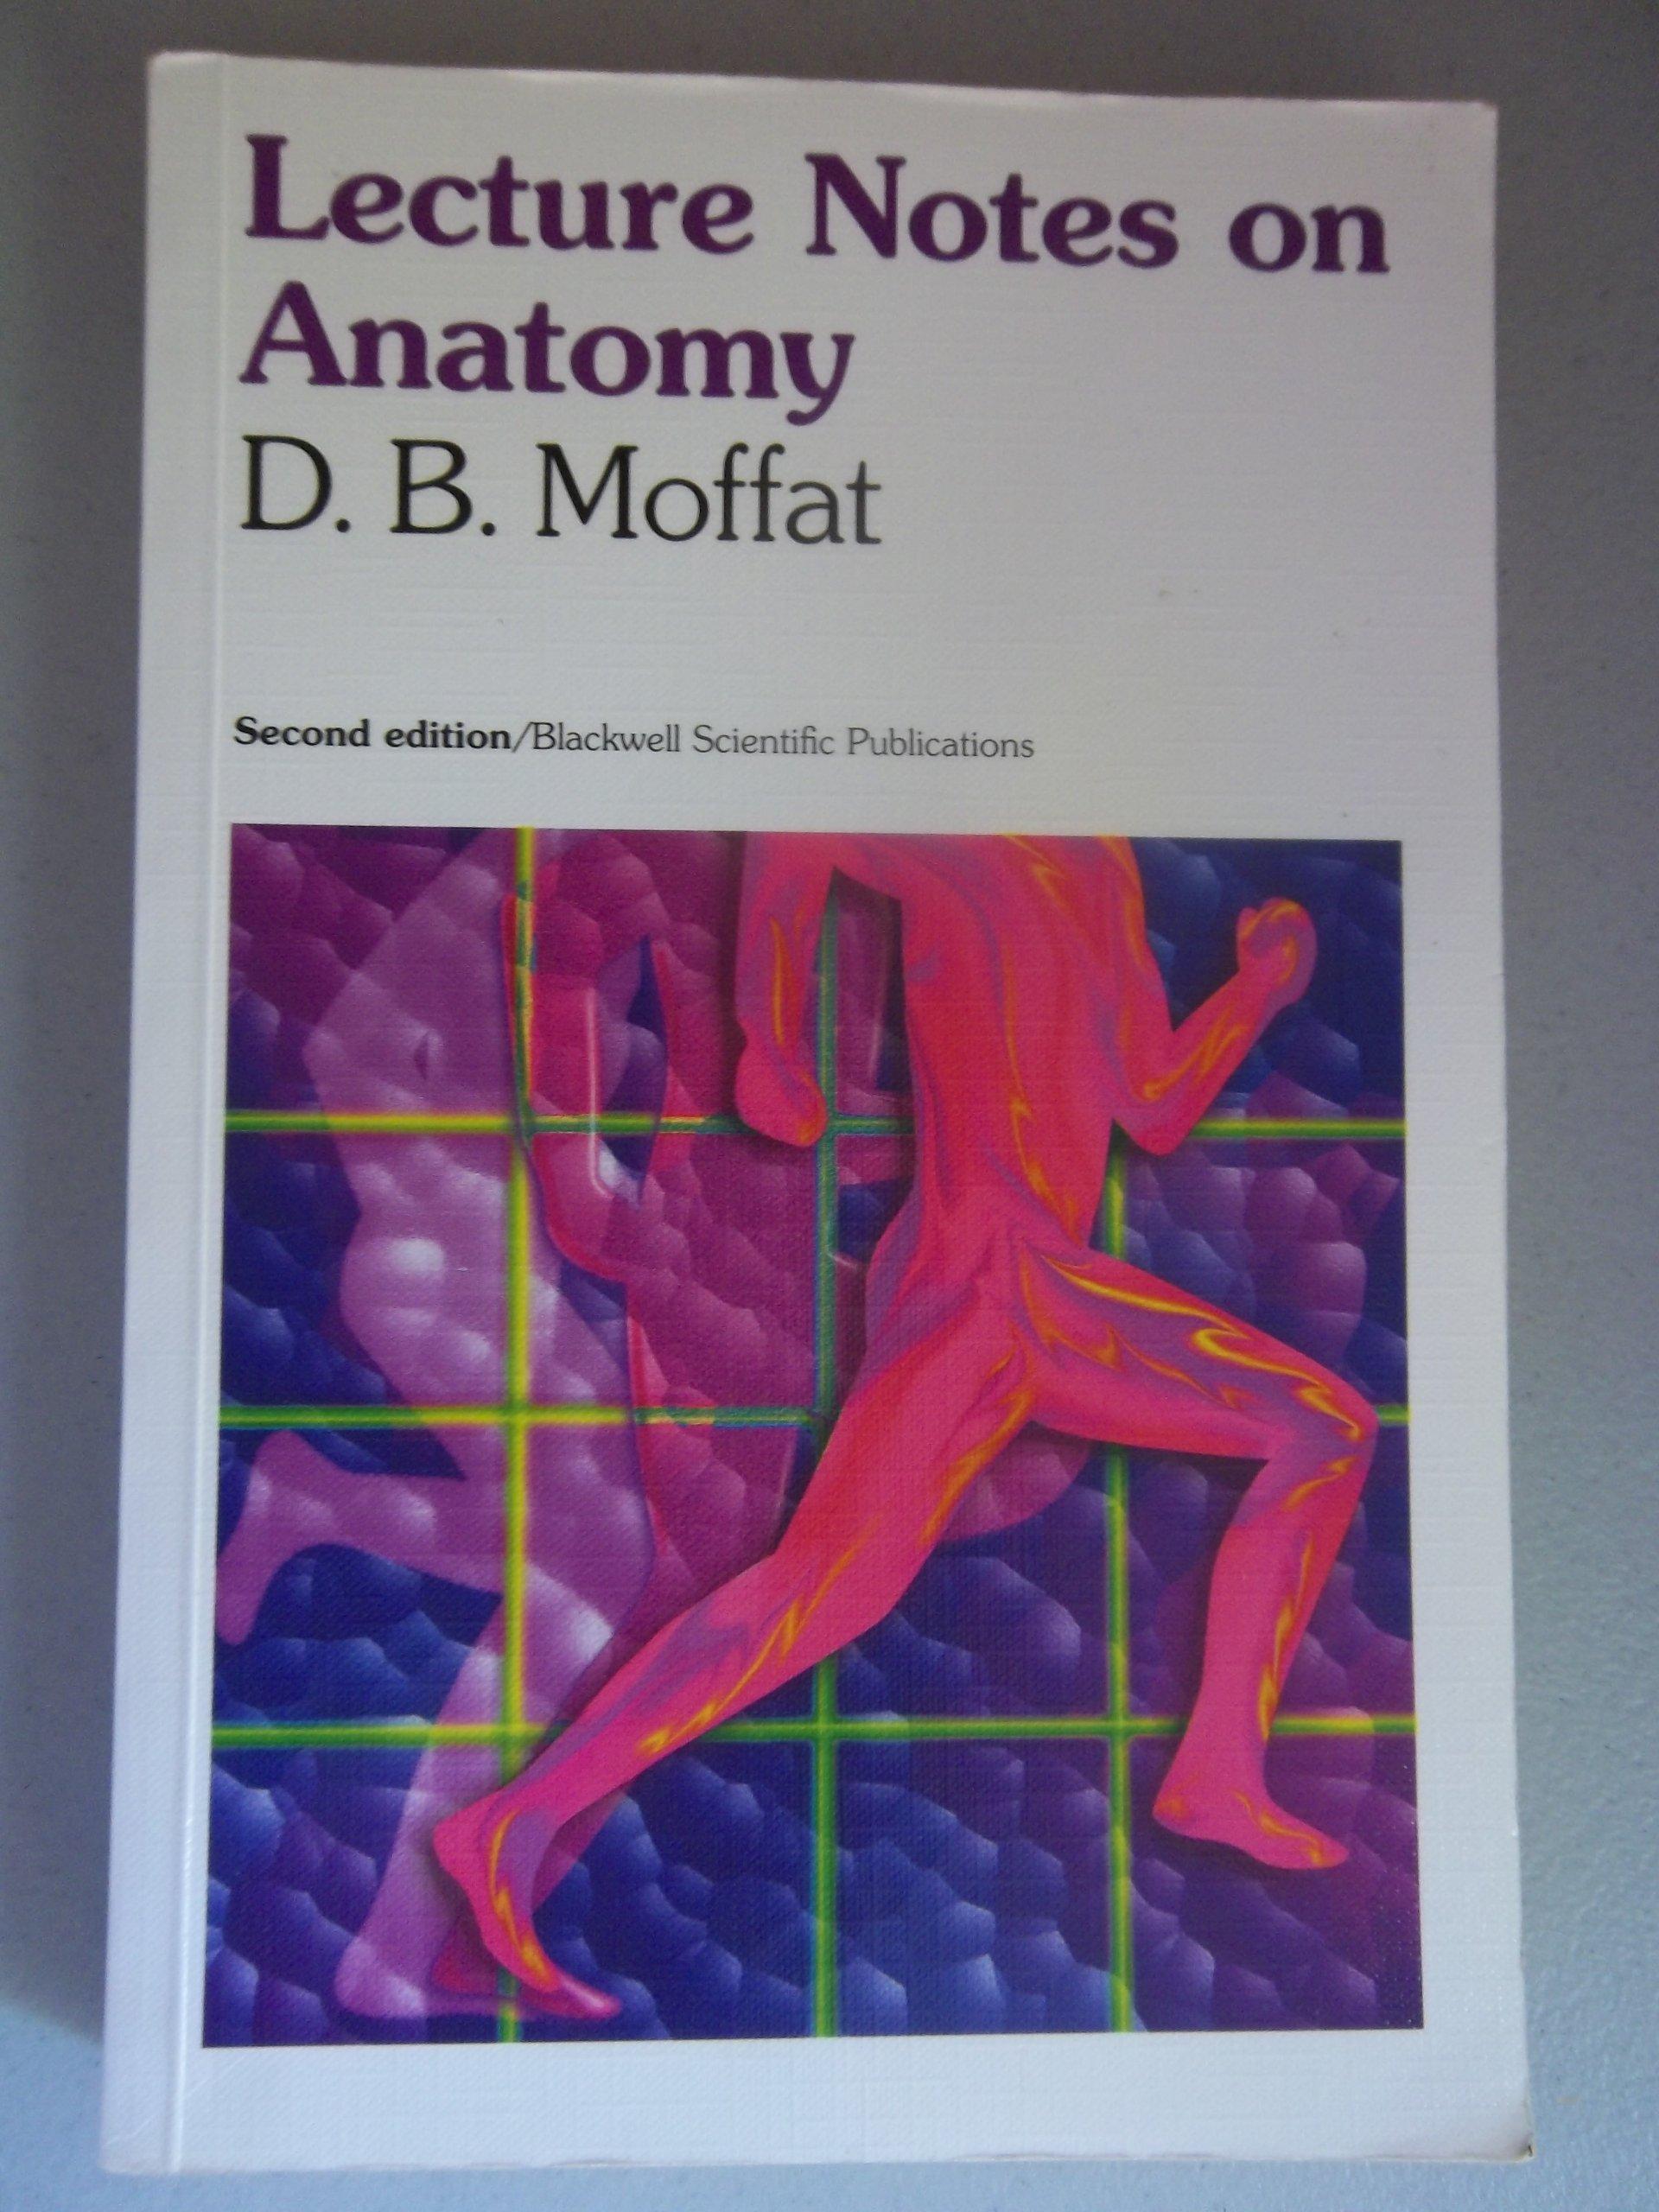 Lecture Notes On Anatomy David B Moffat 9780632037681 Amazon